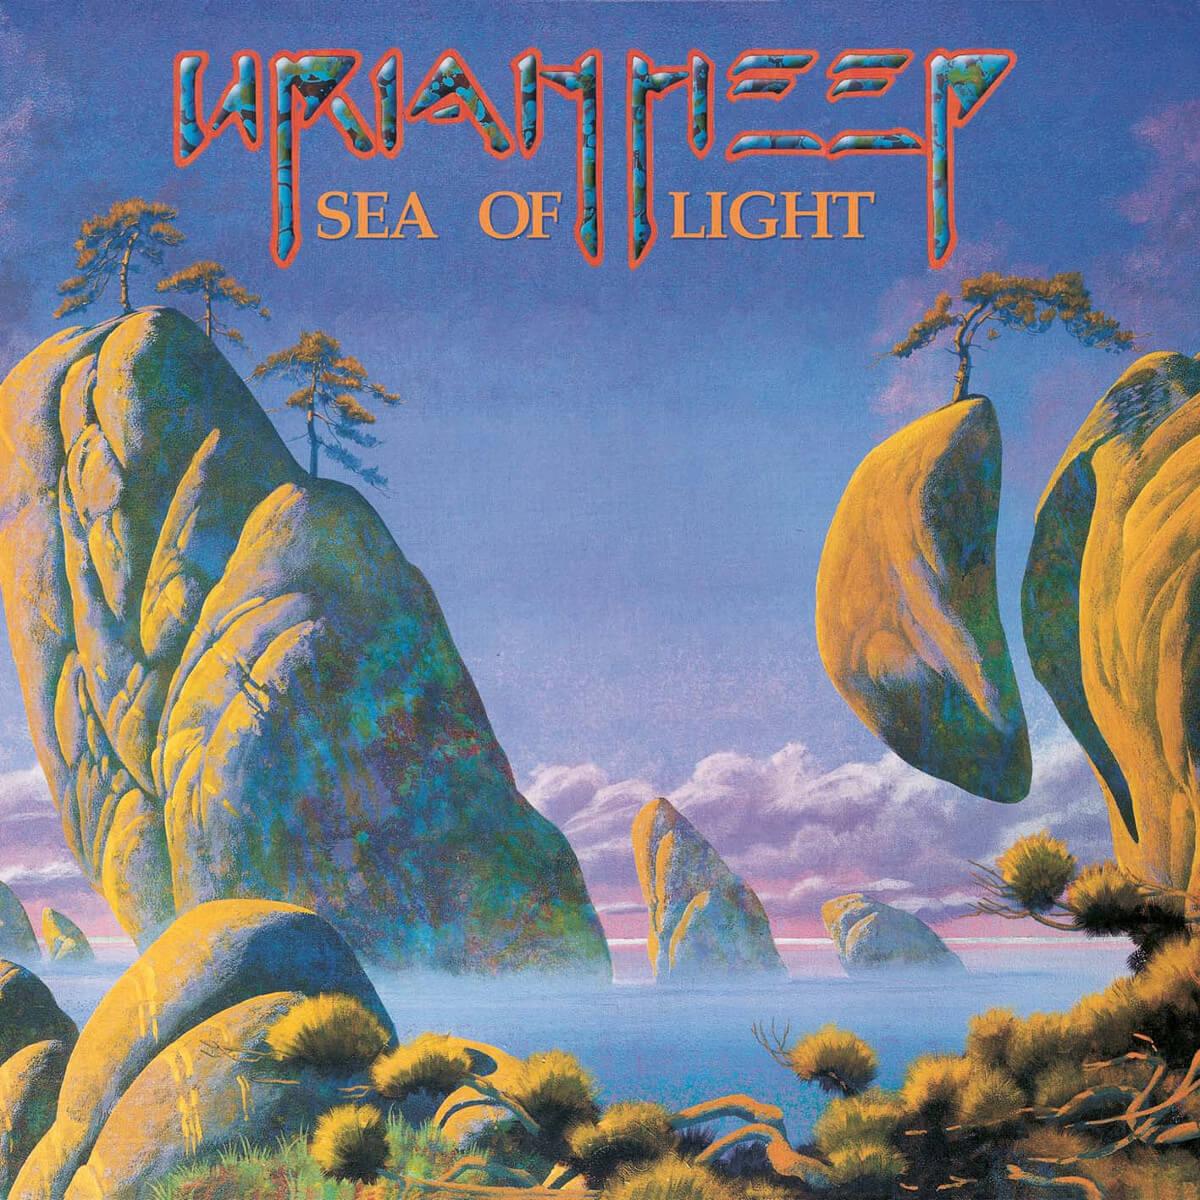 Uriah Heep - Sea of Light - Vinil Cover